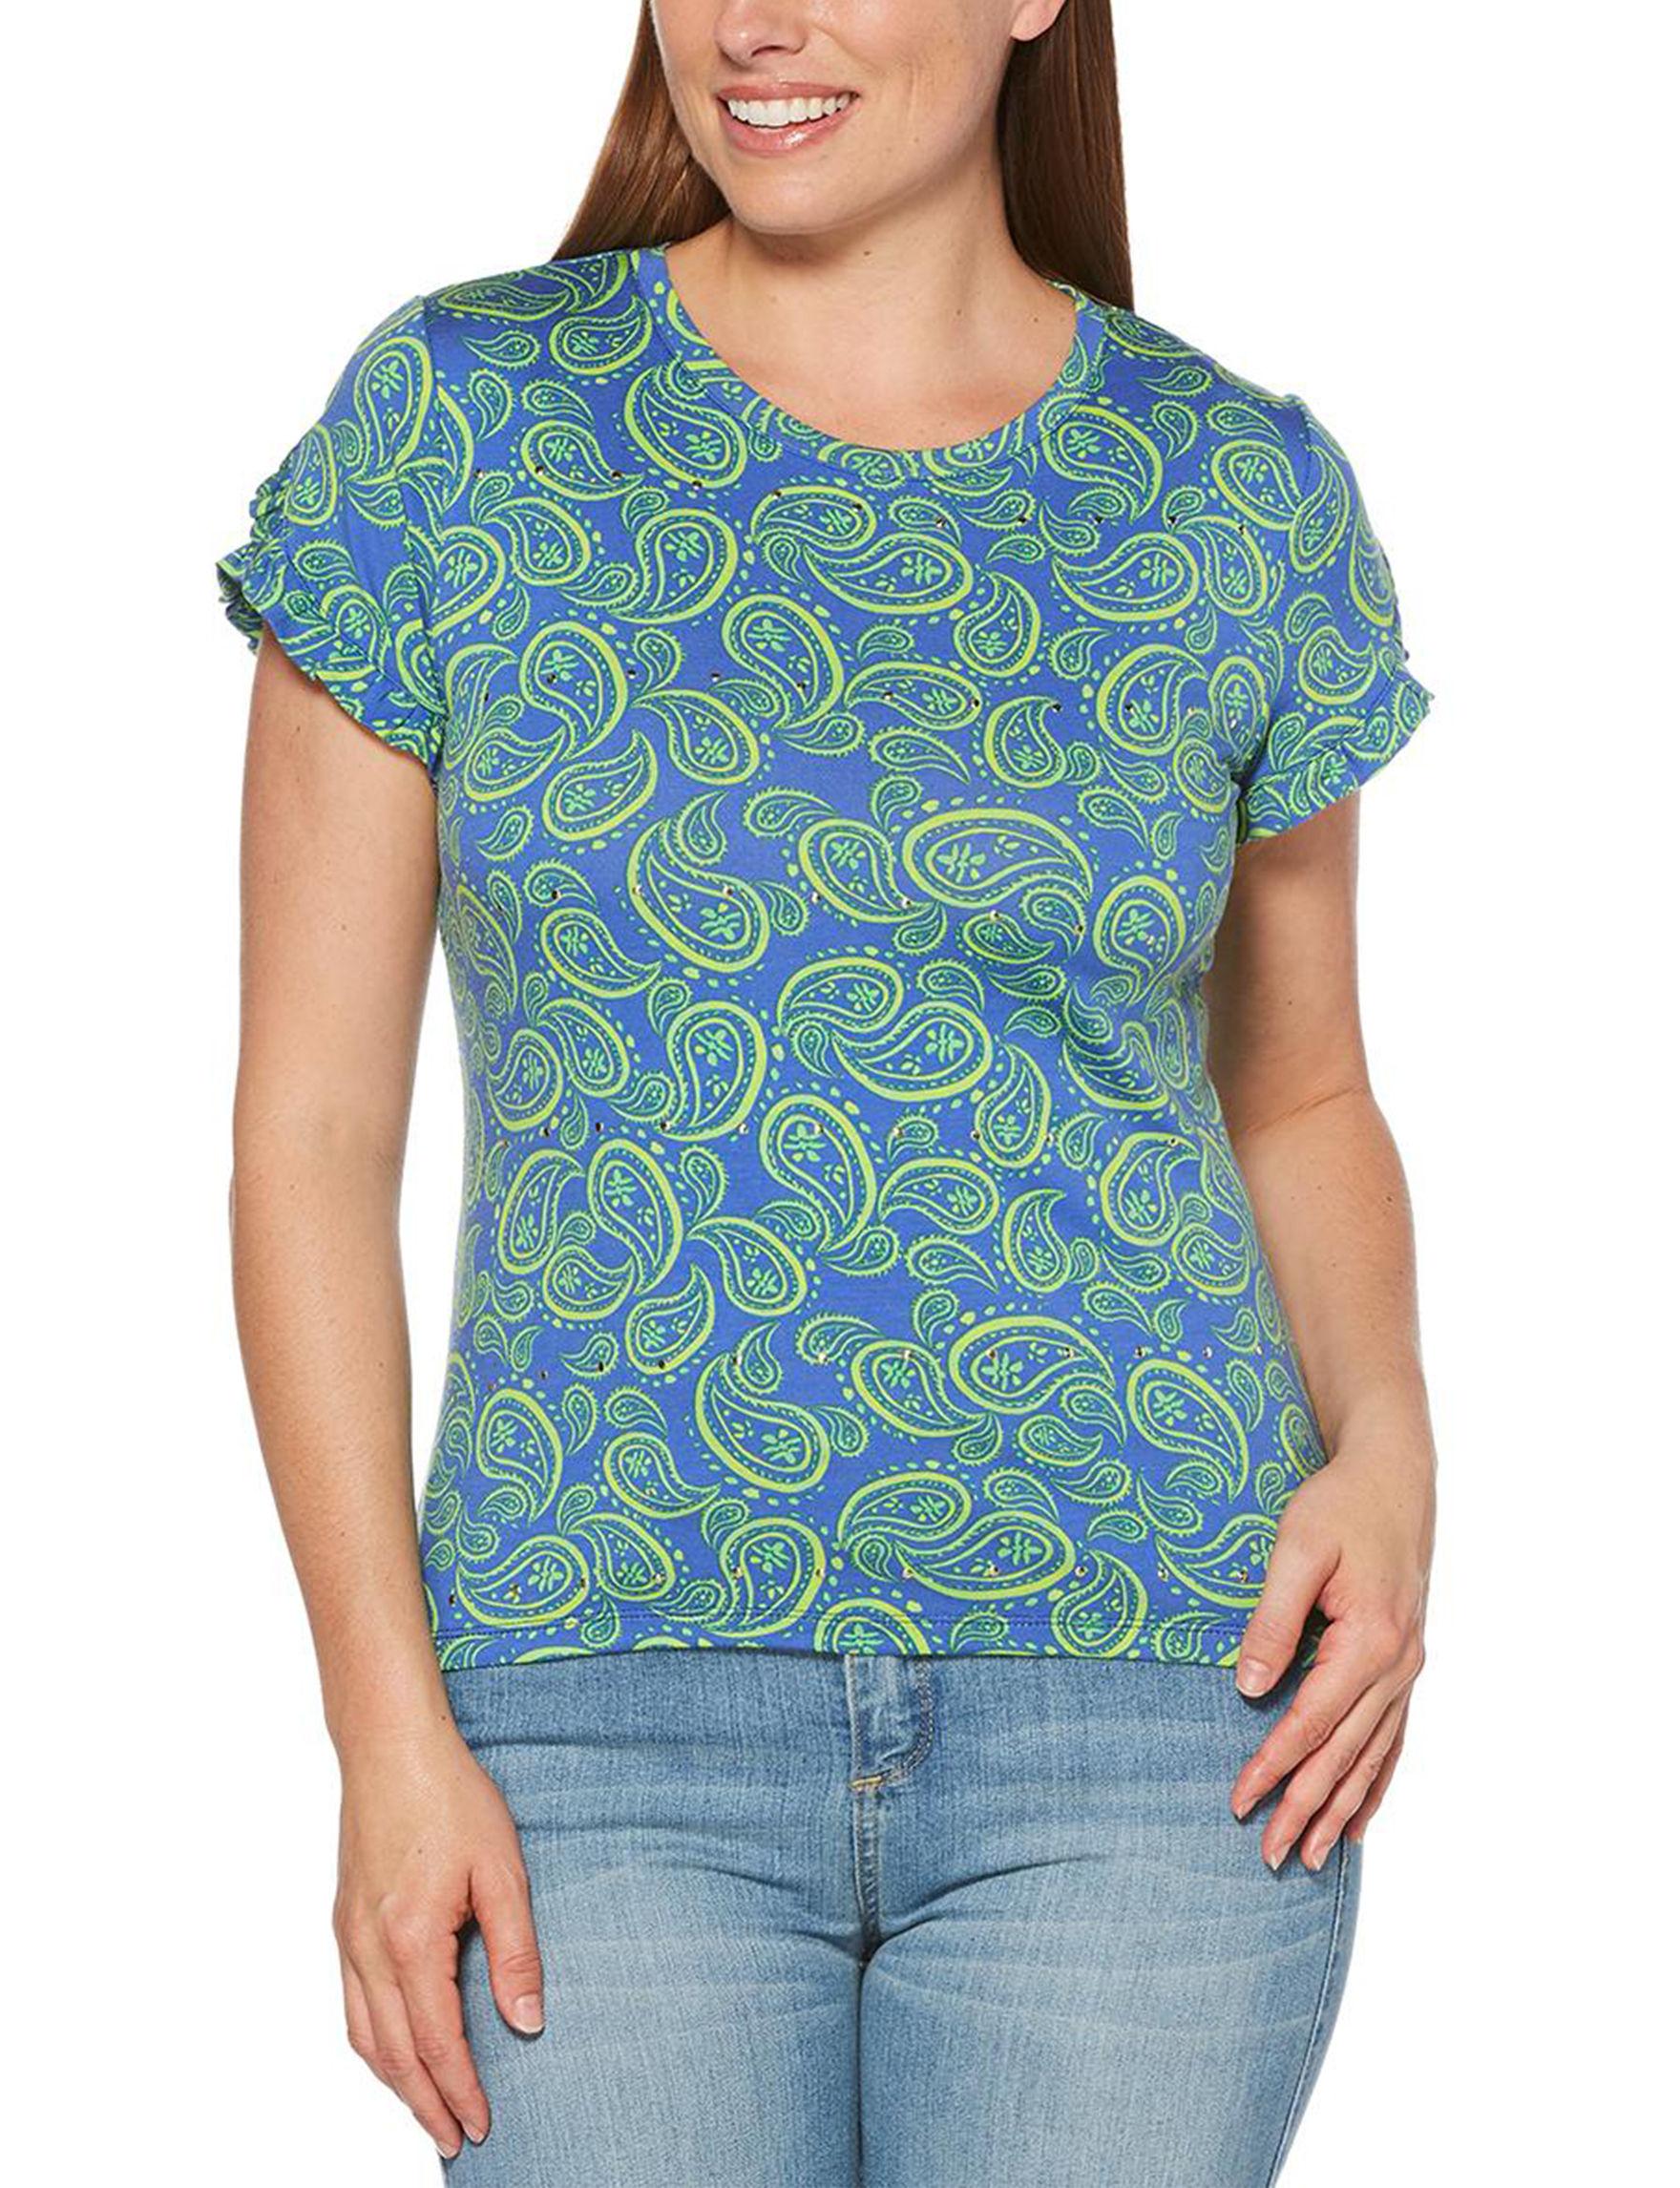 Rafaella Navy / Green Shirts & Blouses Tees & Tanks